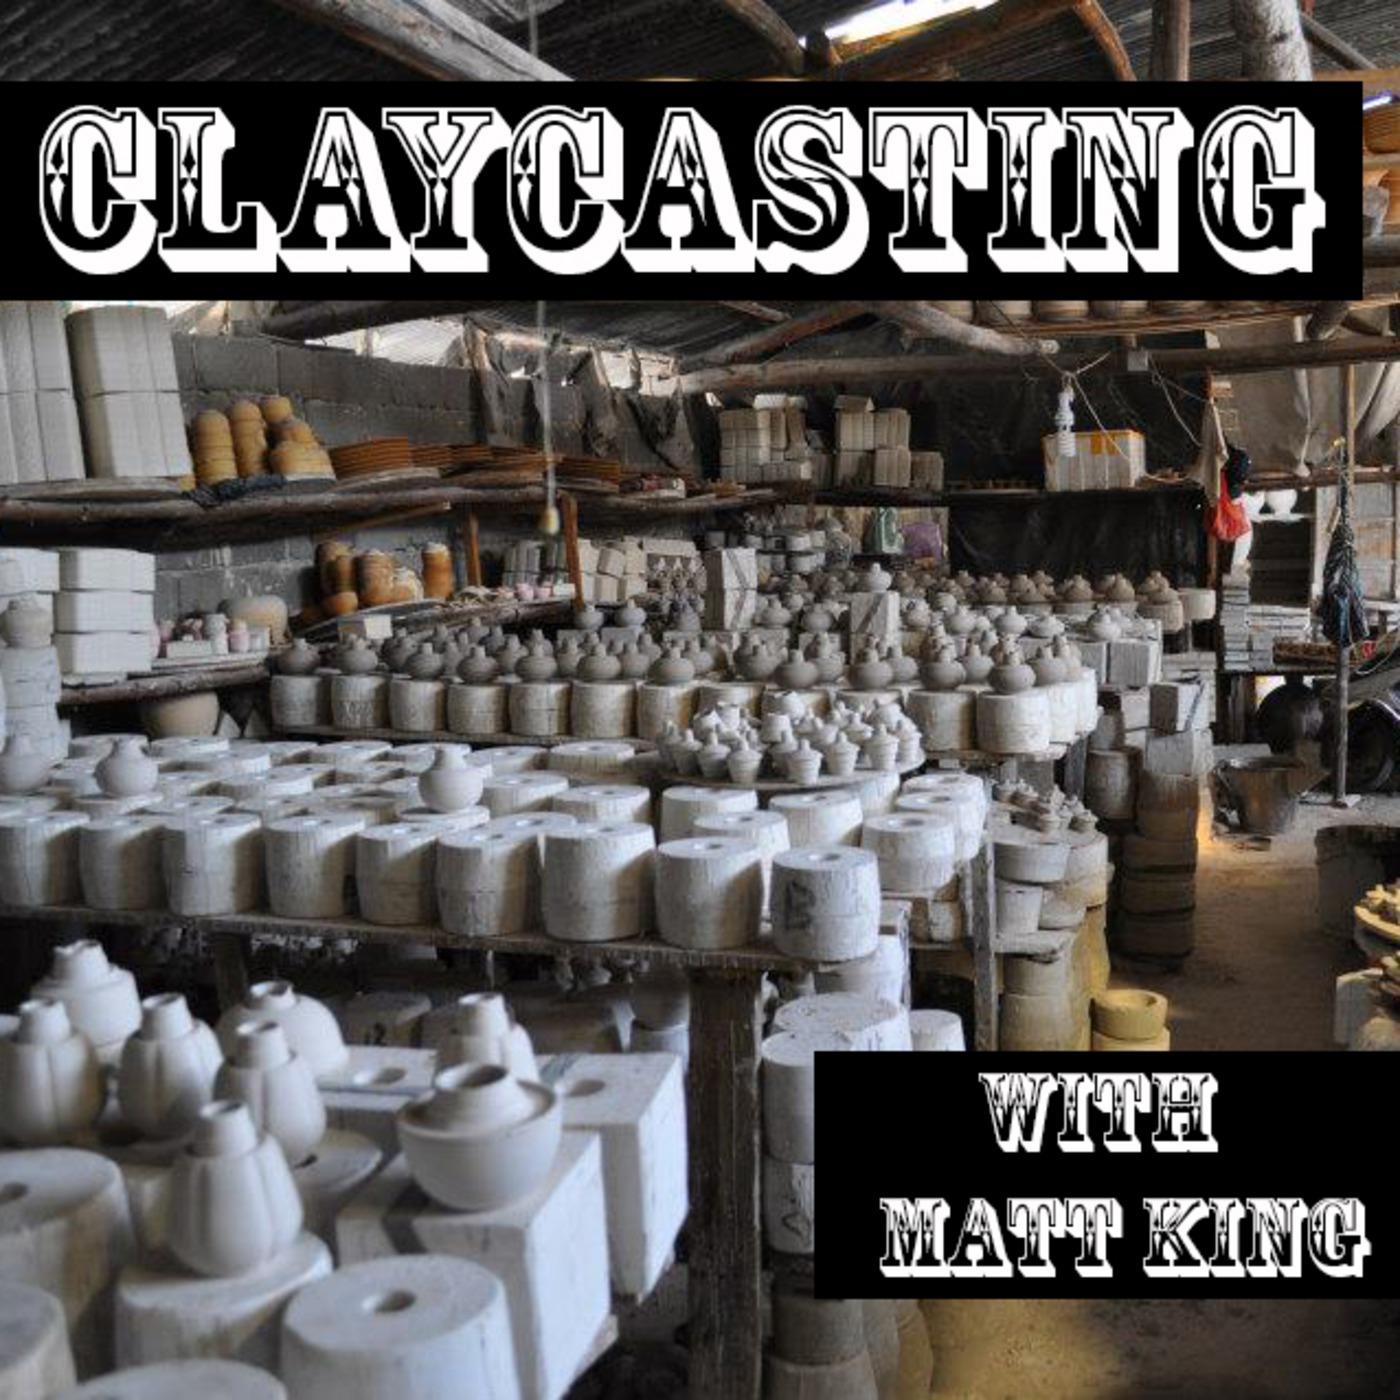 Claycasting #2 - Todd Shanafelt